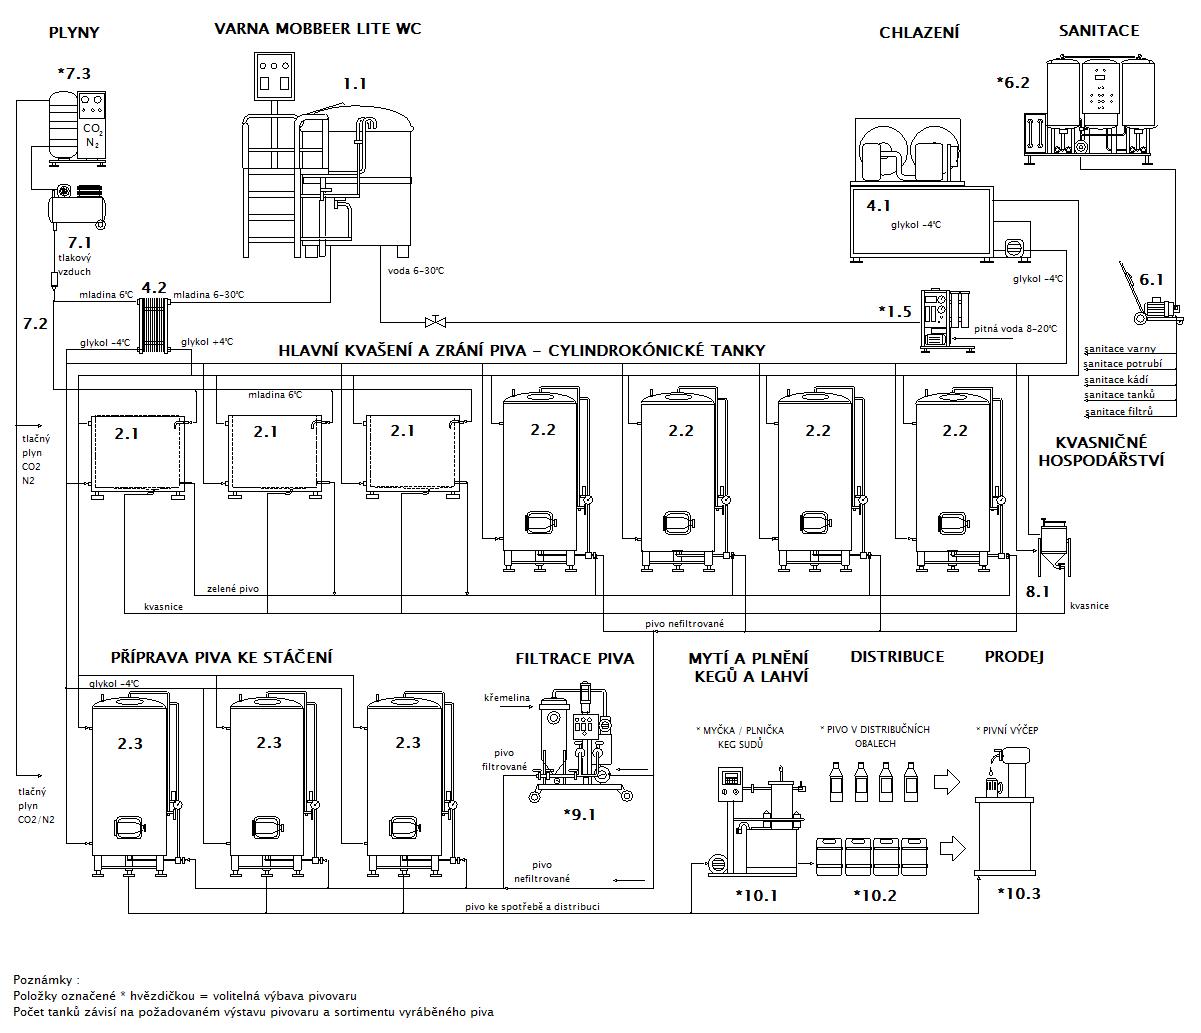 Block Diagram Microbrewery Mobbeer Wc Of Lite